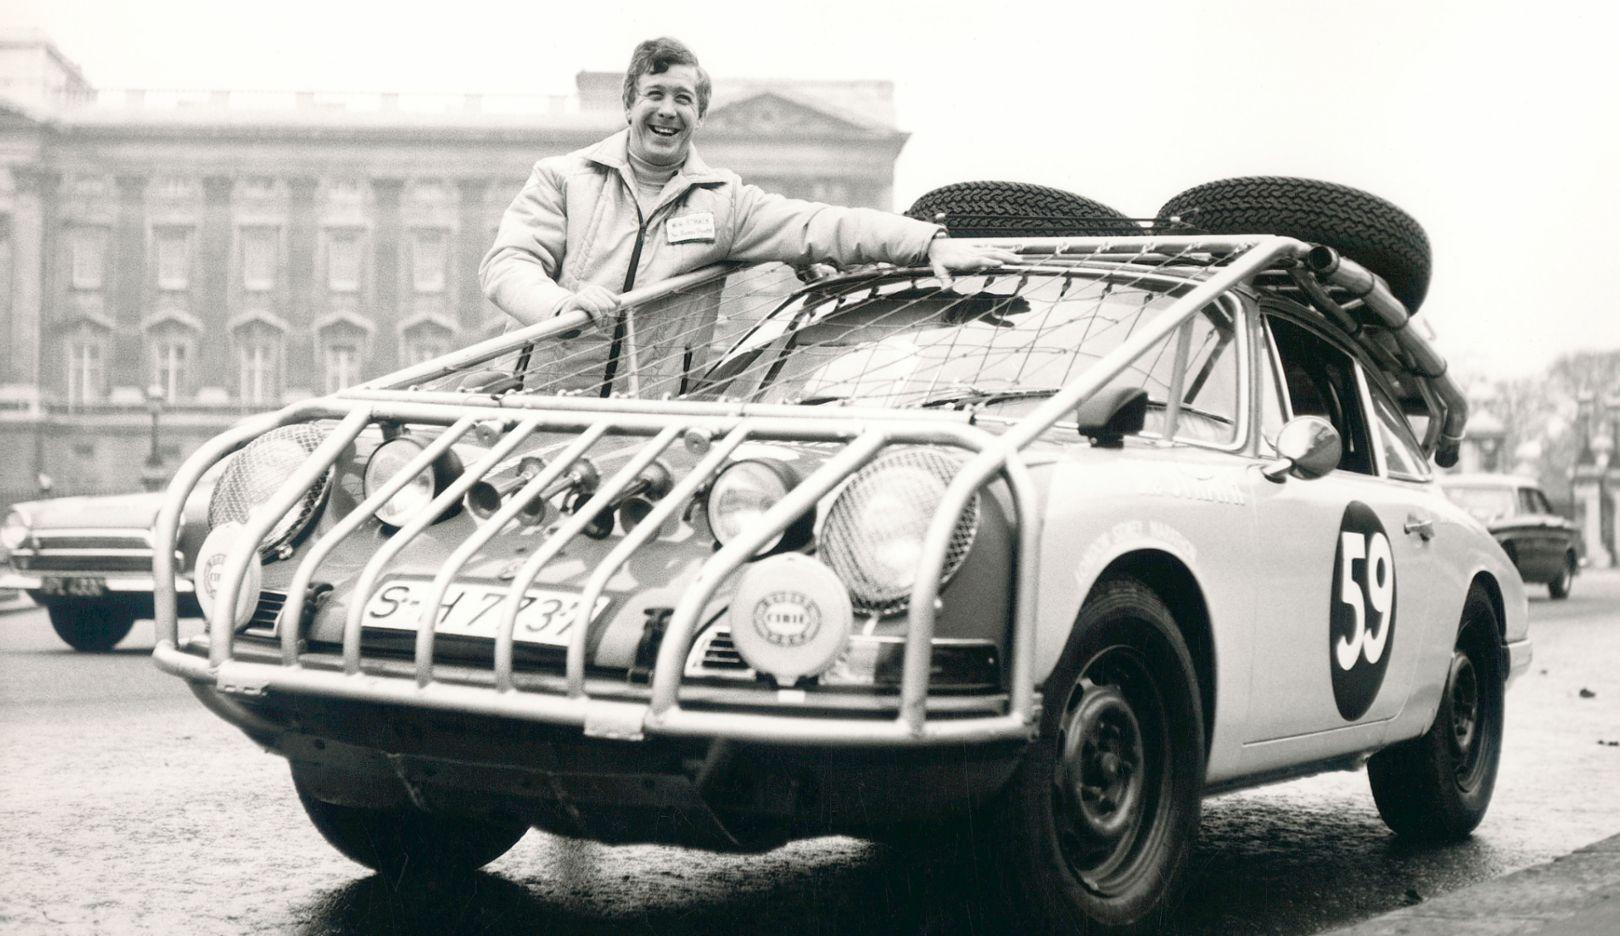 1968 London-Sydney, Porsche 911 S 2,0, Porsche AG